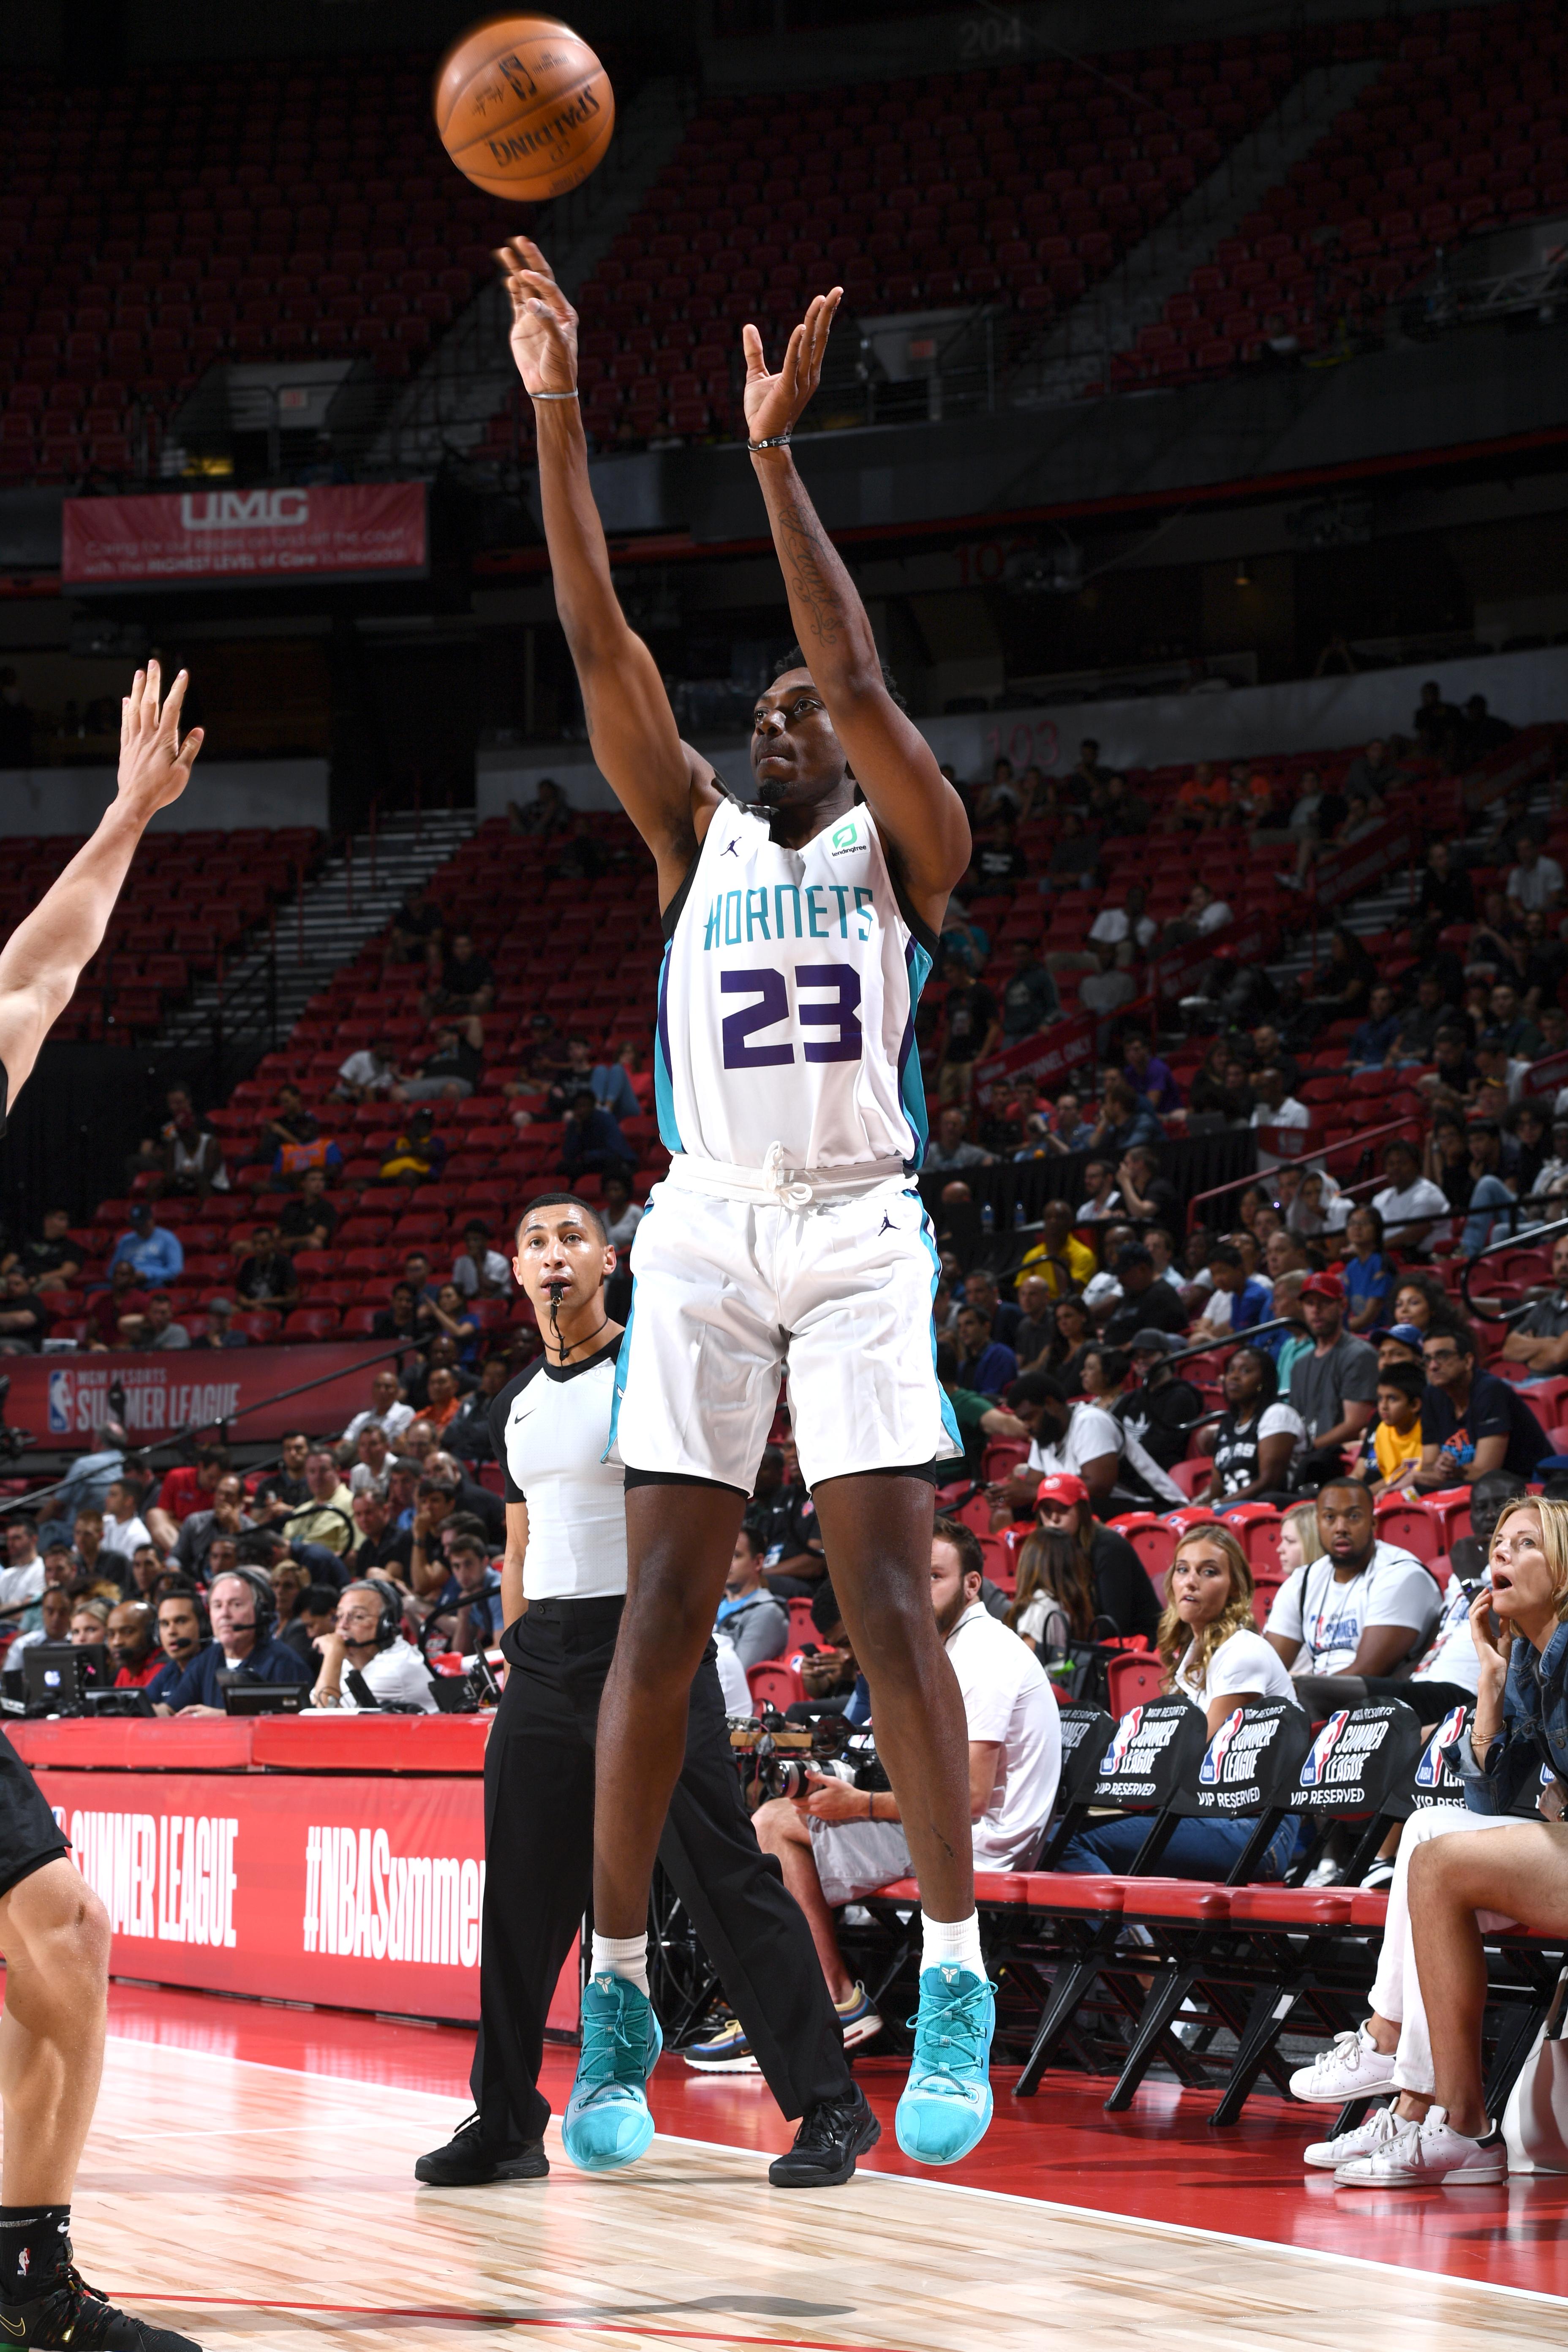 2019 Las Vegas Summer League - Day 3 - San Antonio Spurs v Charlotte Hornets